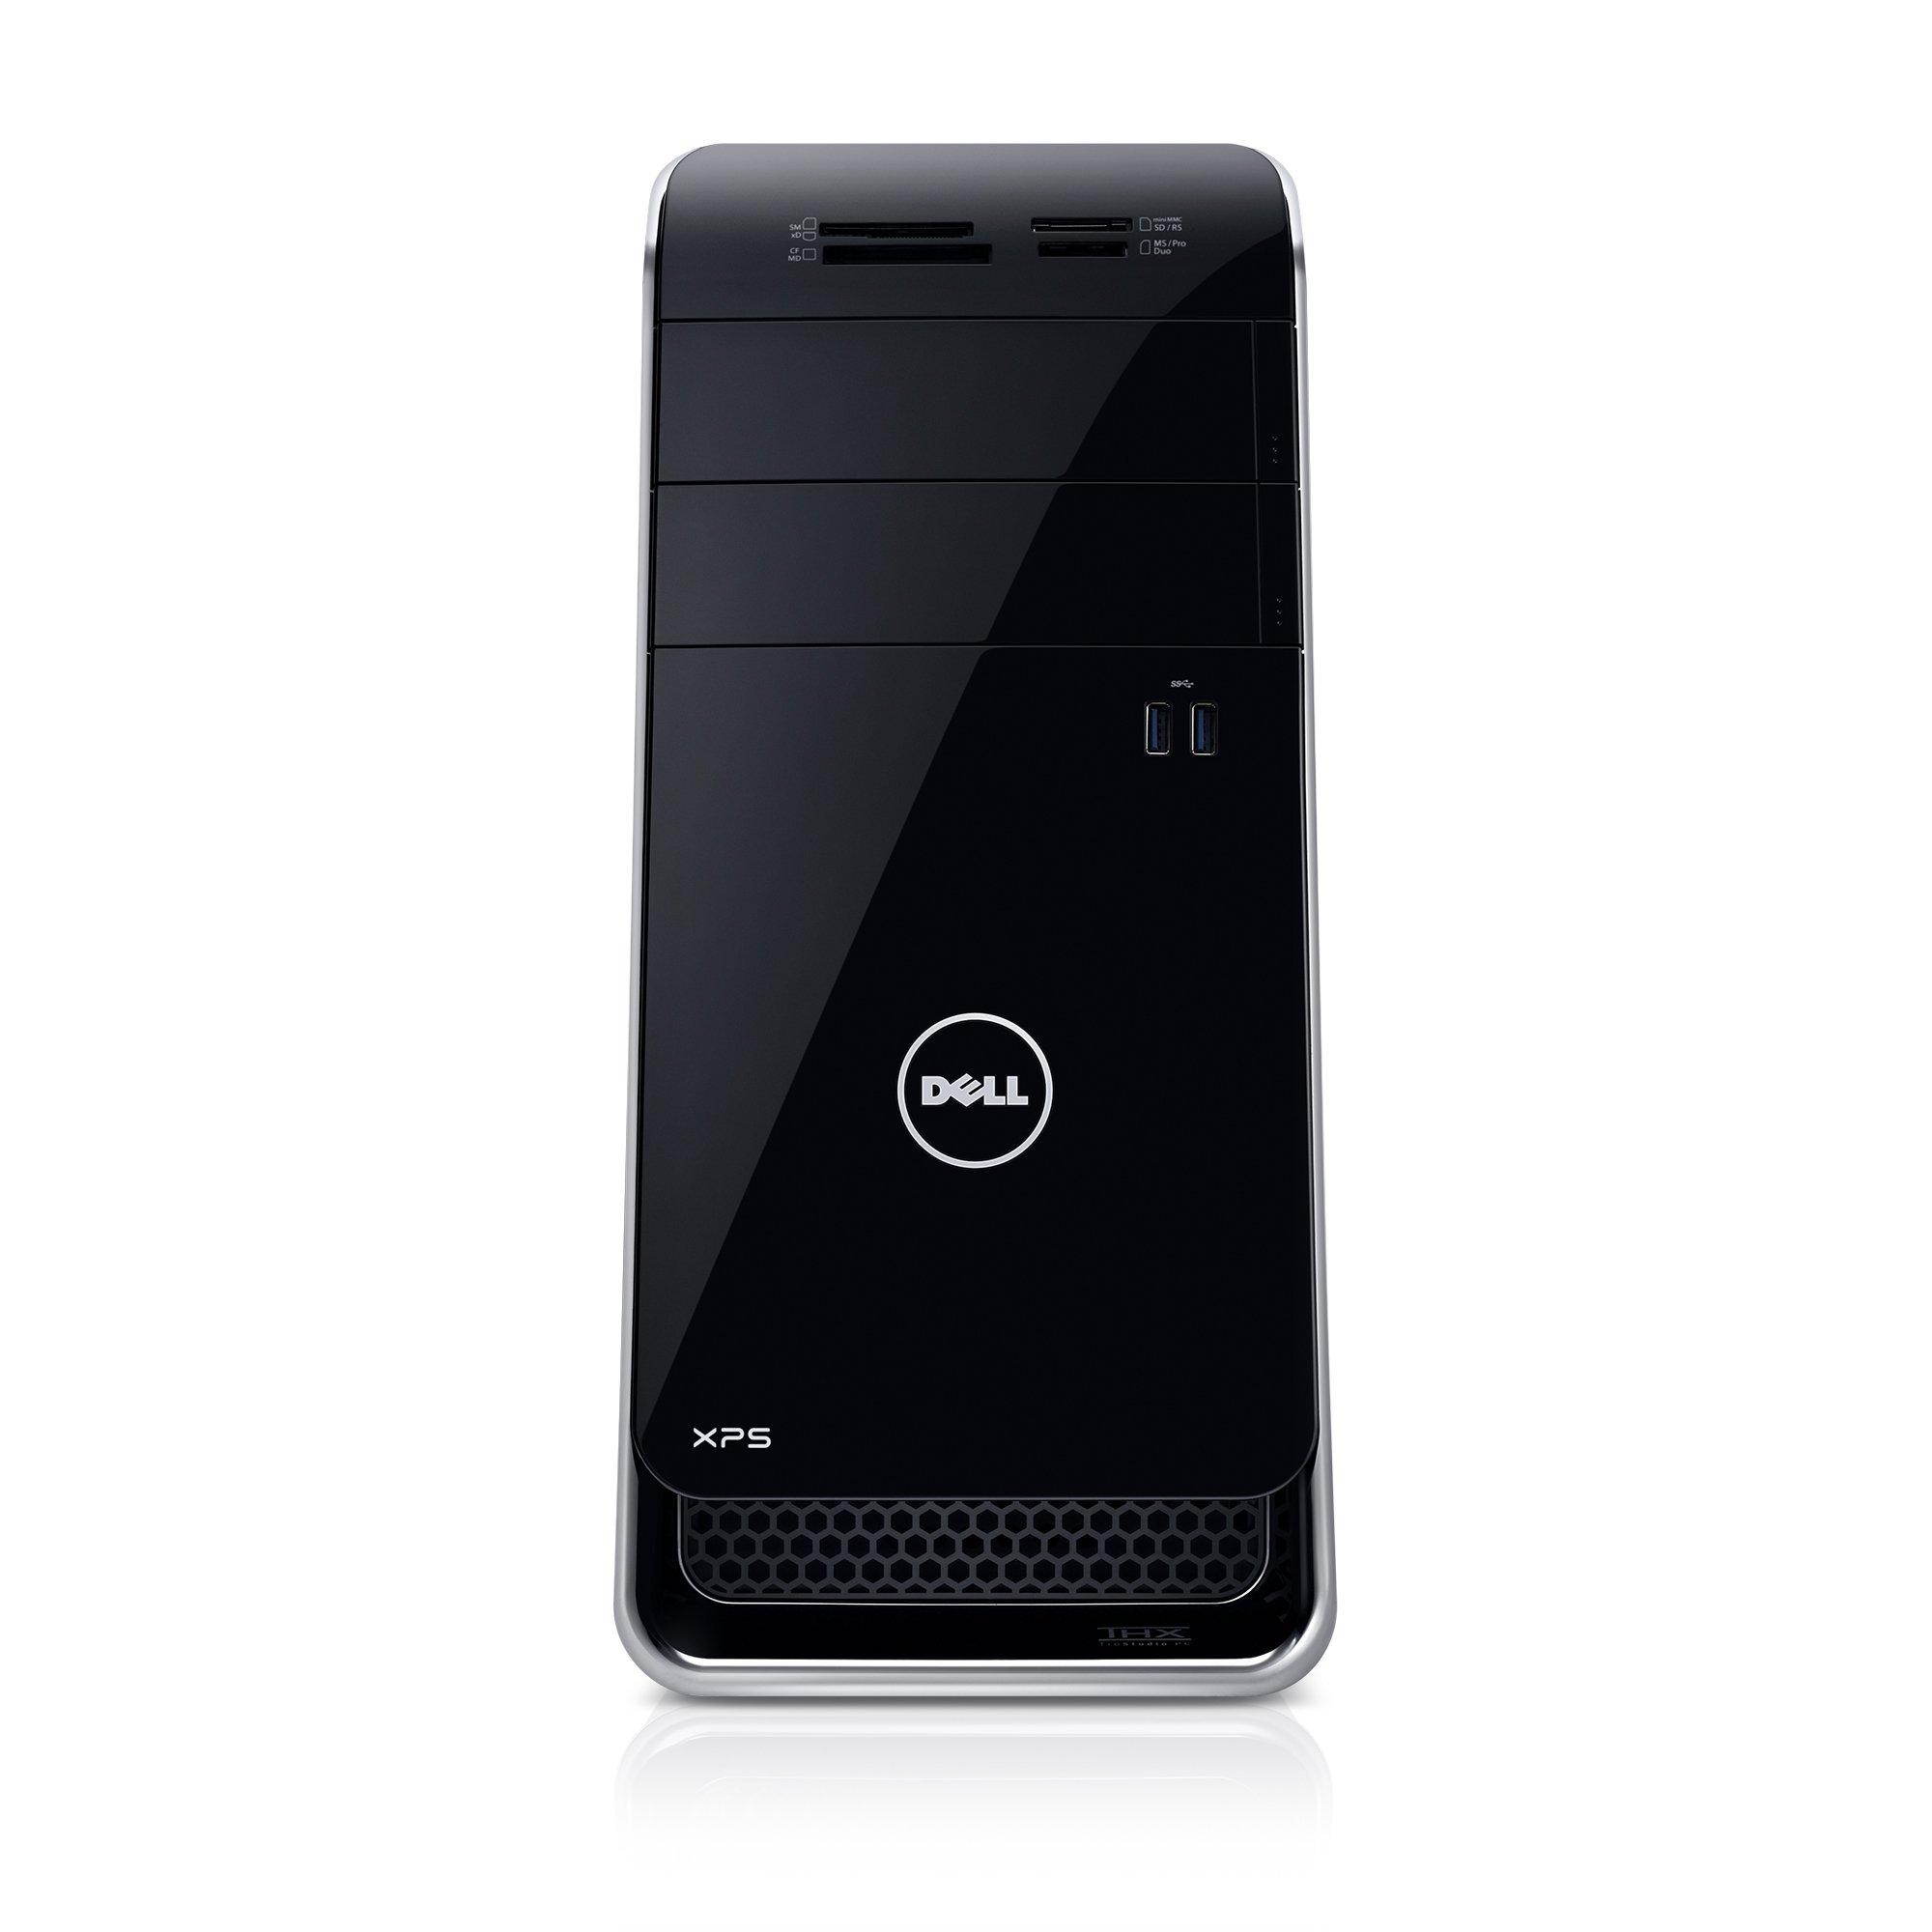 Dell XPS x8900-1444BLK Desktop (6th Generation Intel Core i7, 8 GB RAM, 1 TB HDD) NVIDIA GT 730 by Dell